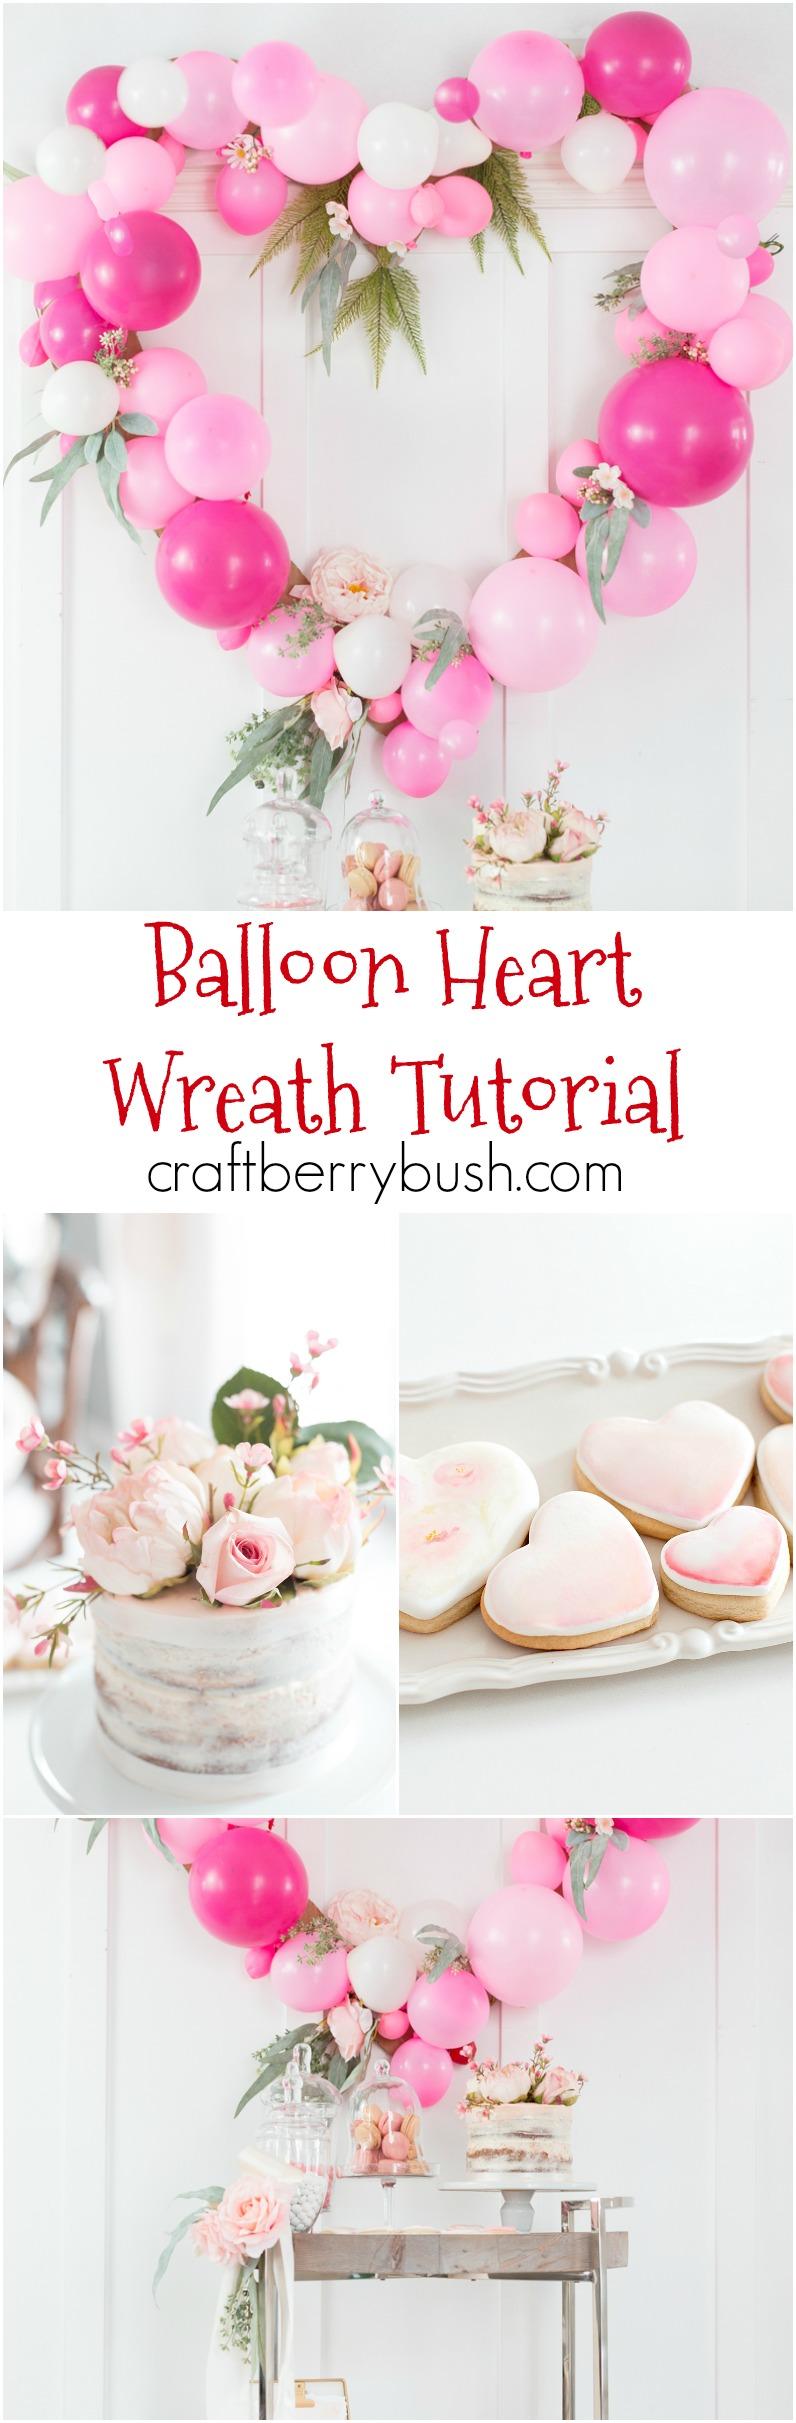 baloonheartwreath